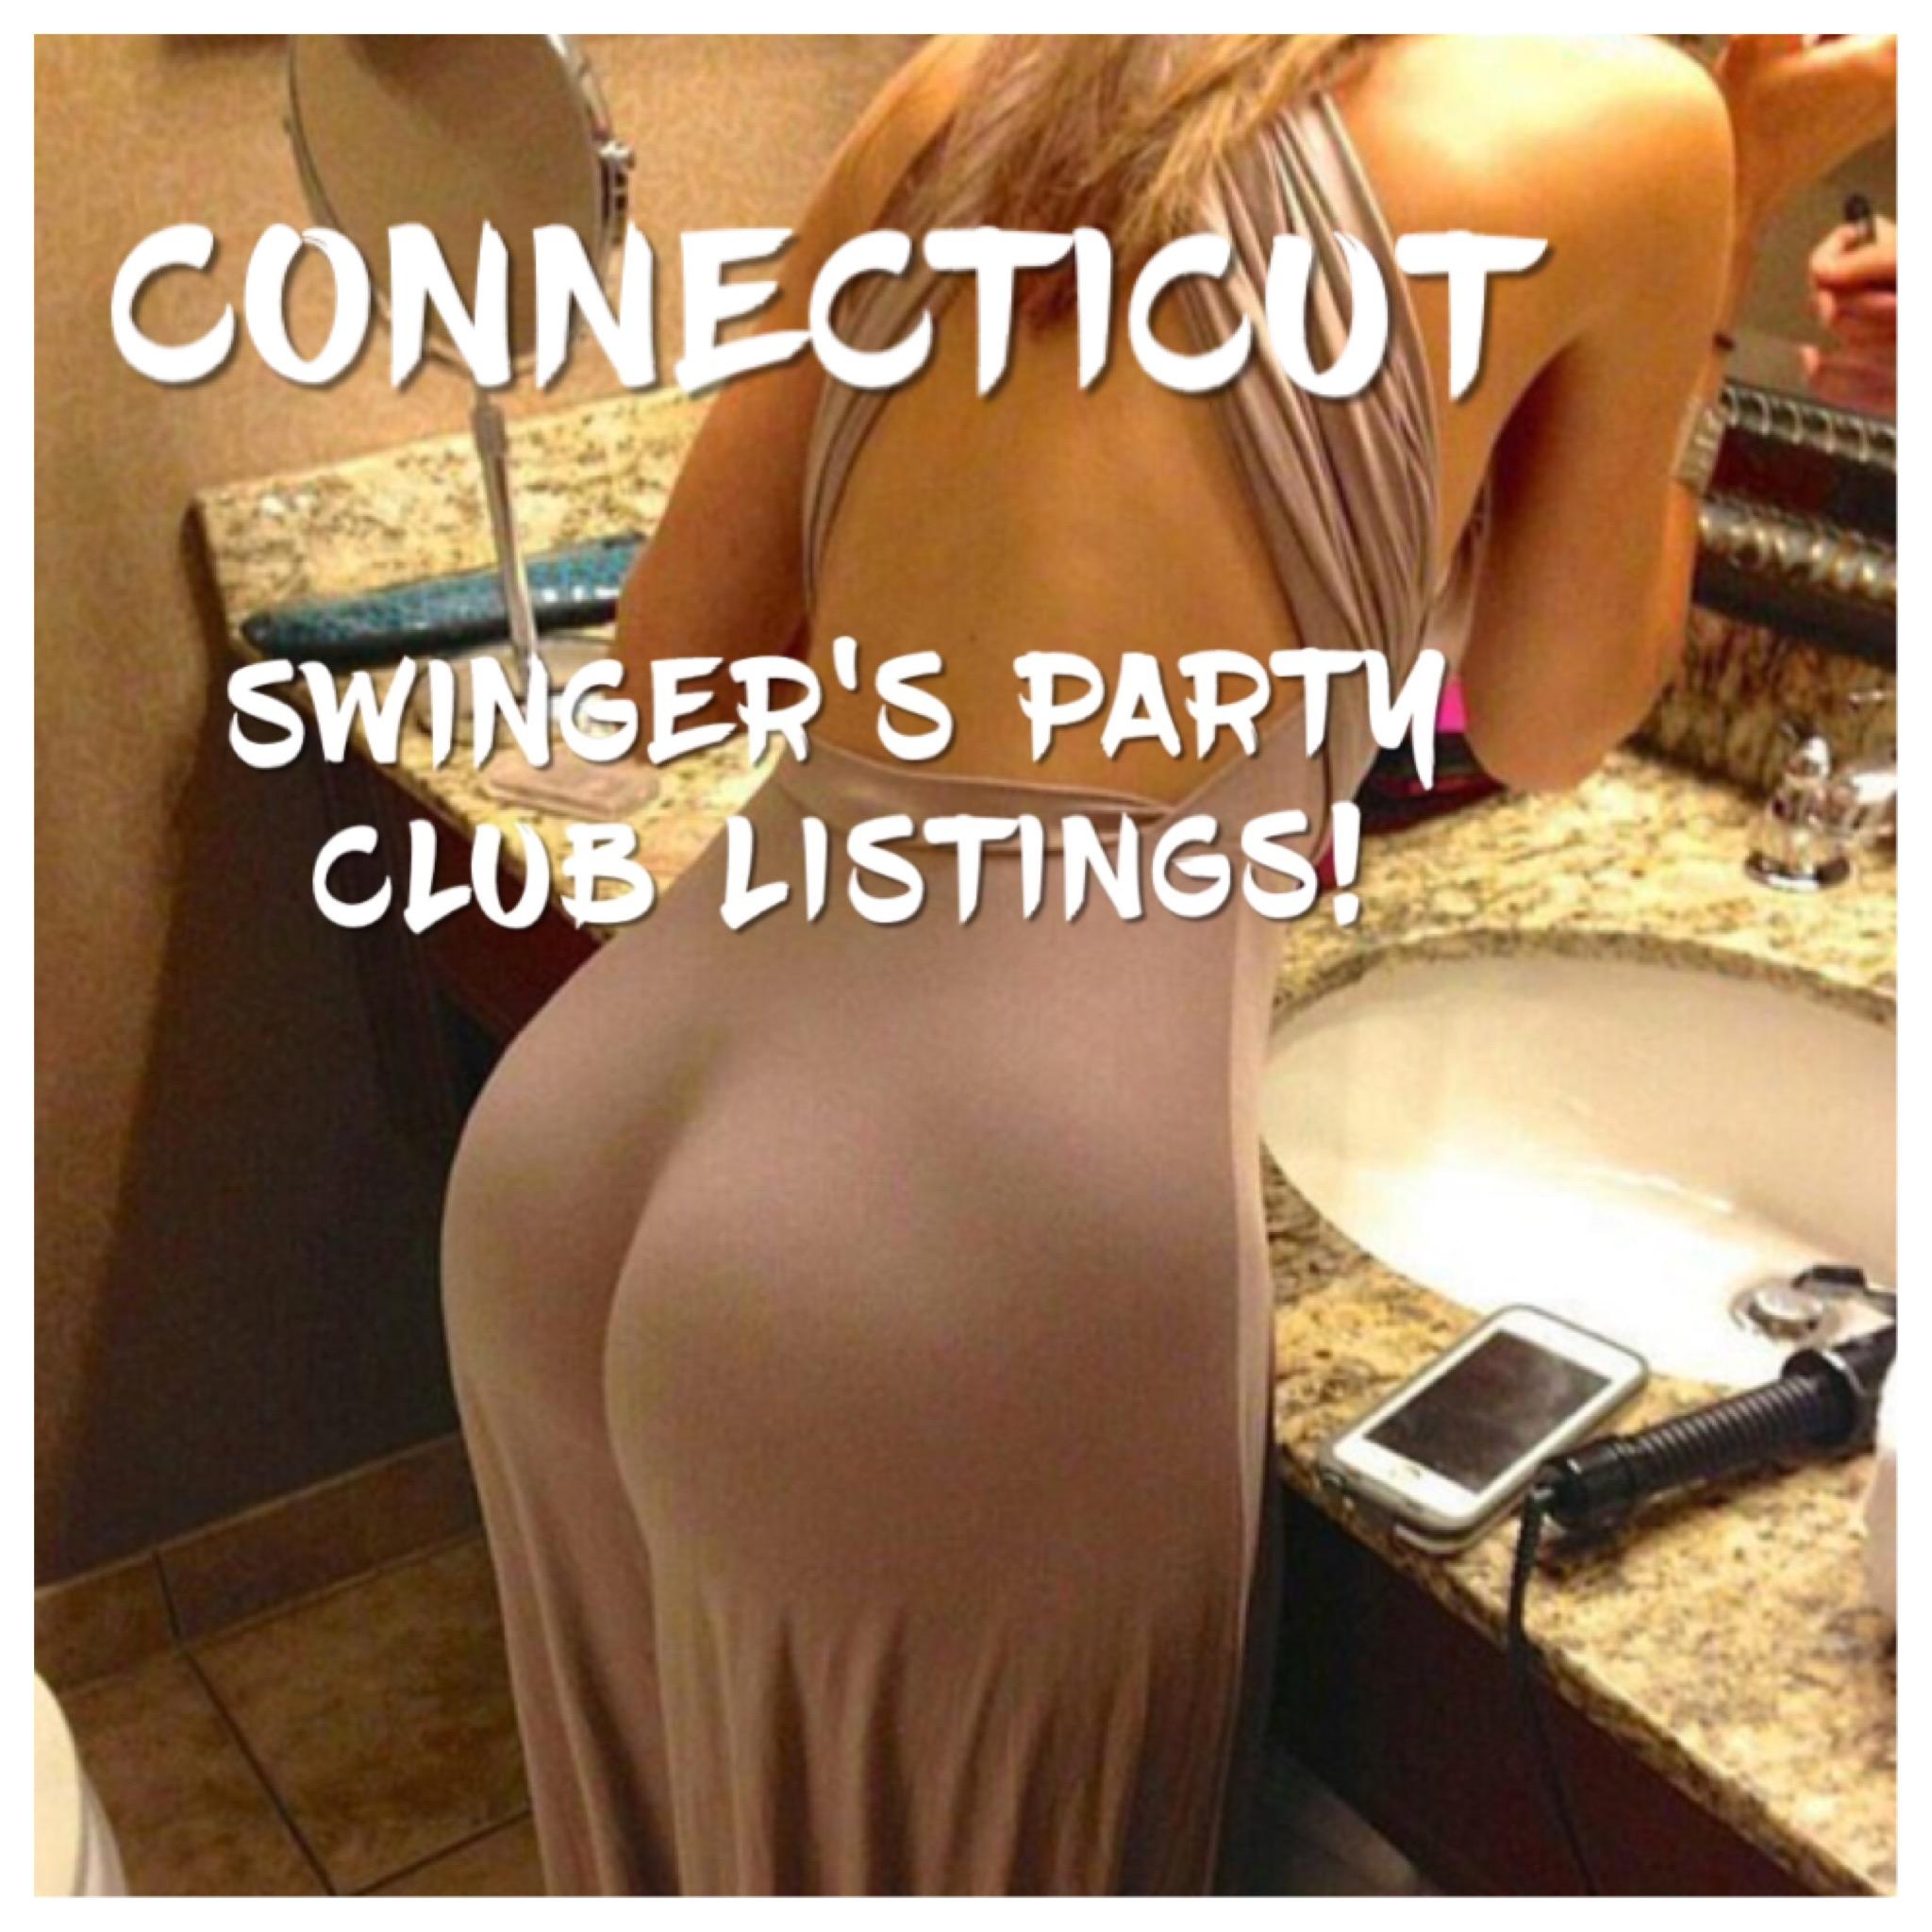 Club delaware near sex swinger think